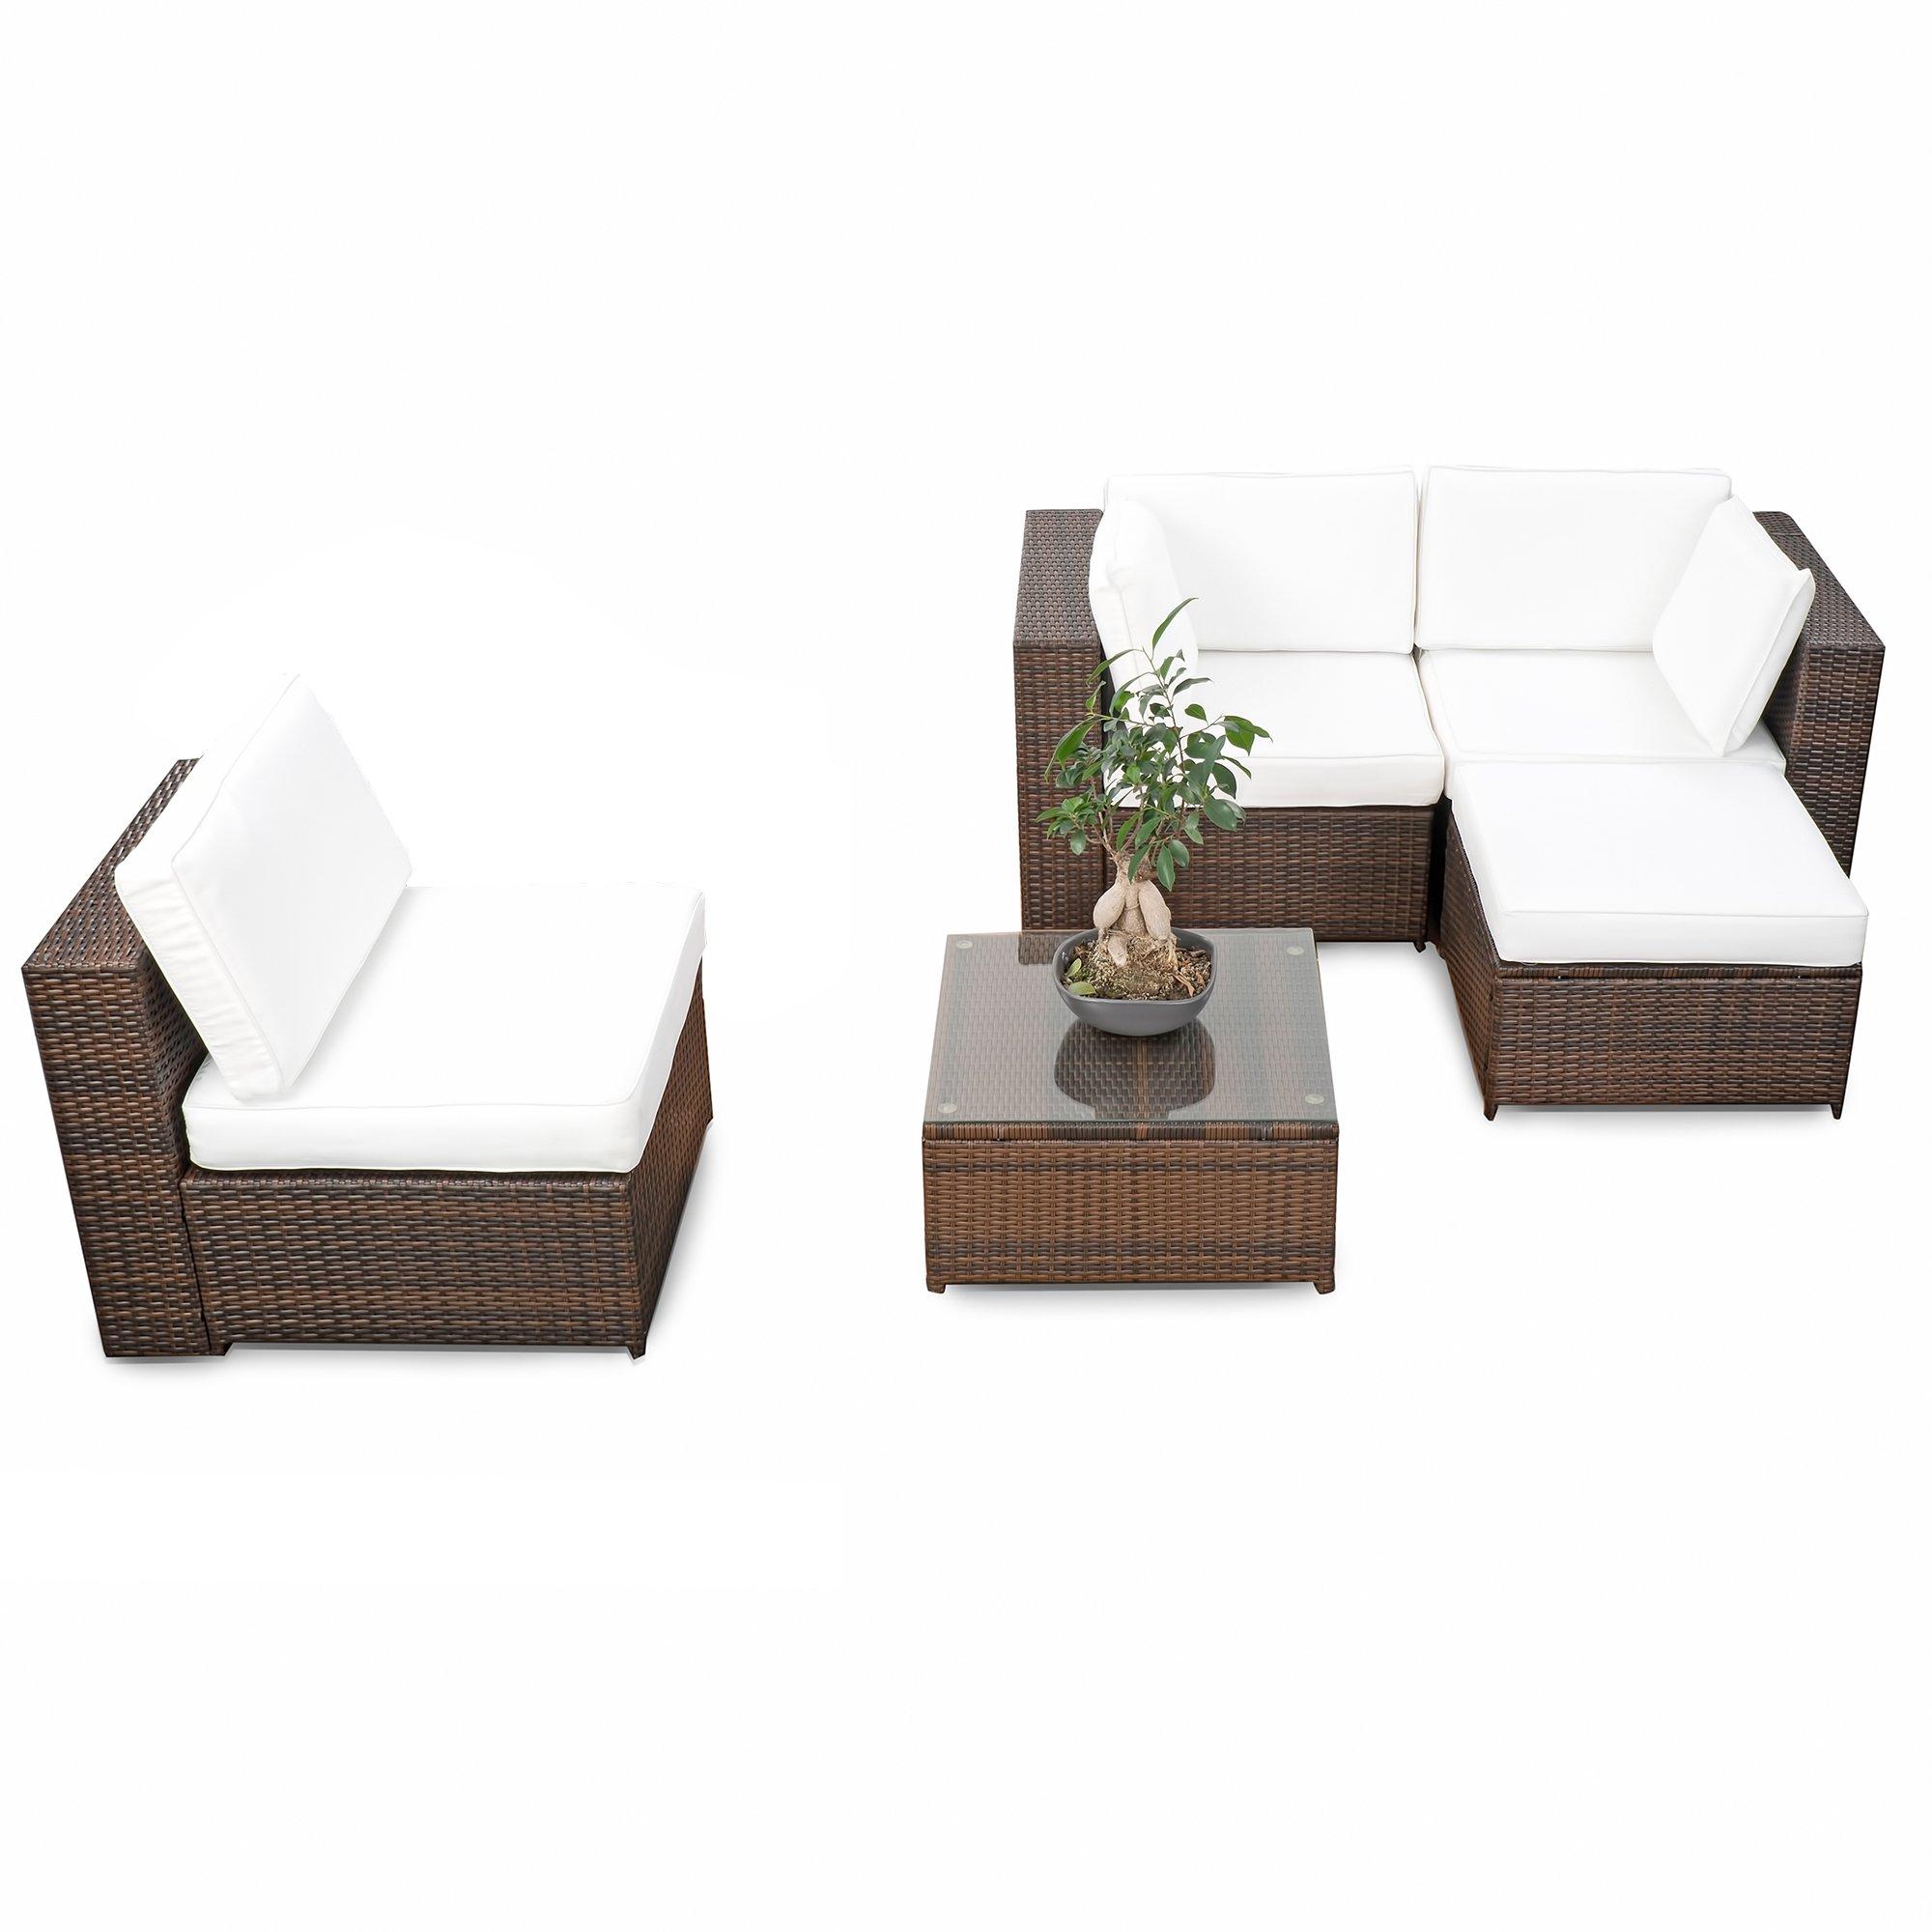 Xinro Erweiterbares 15tlg Balkon Polyrattan Lounge Ecke Braun